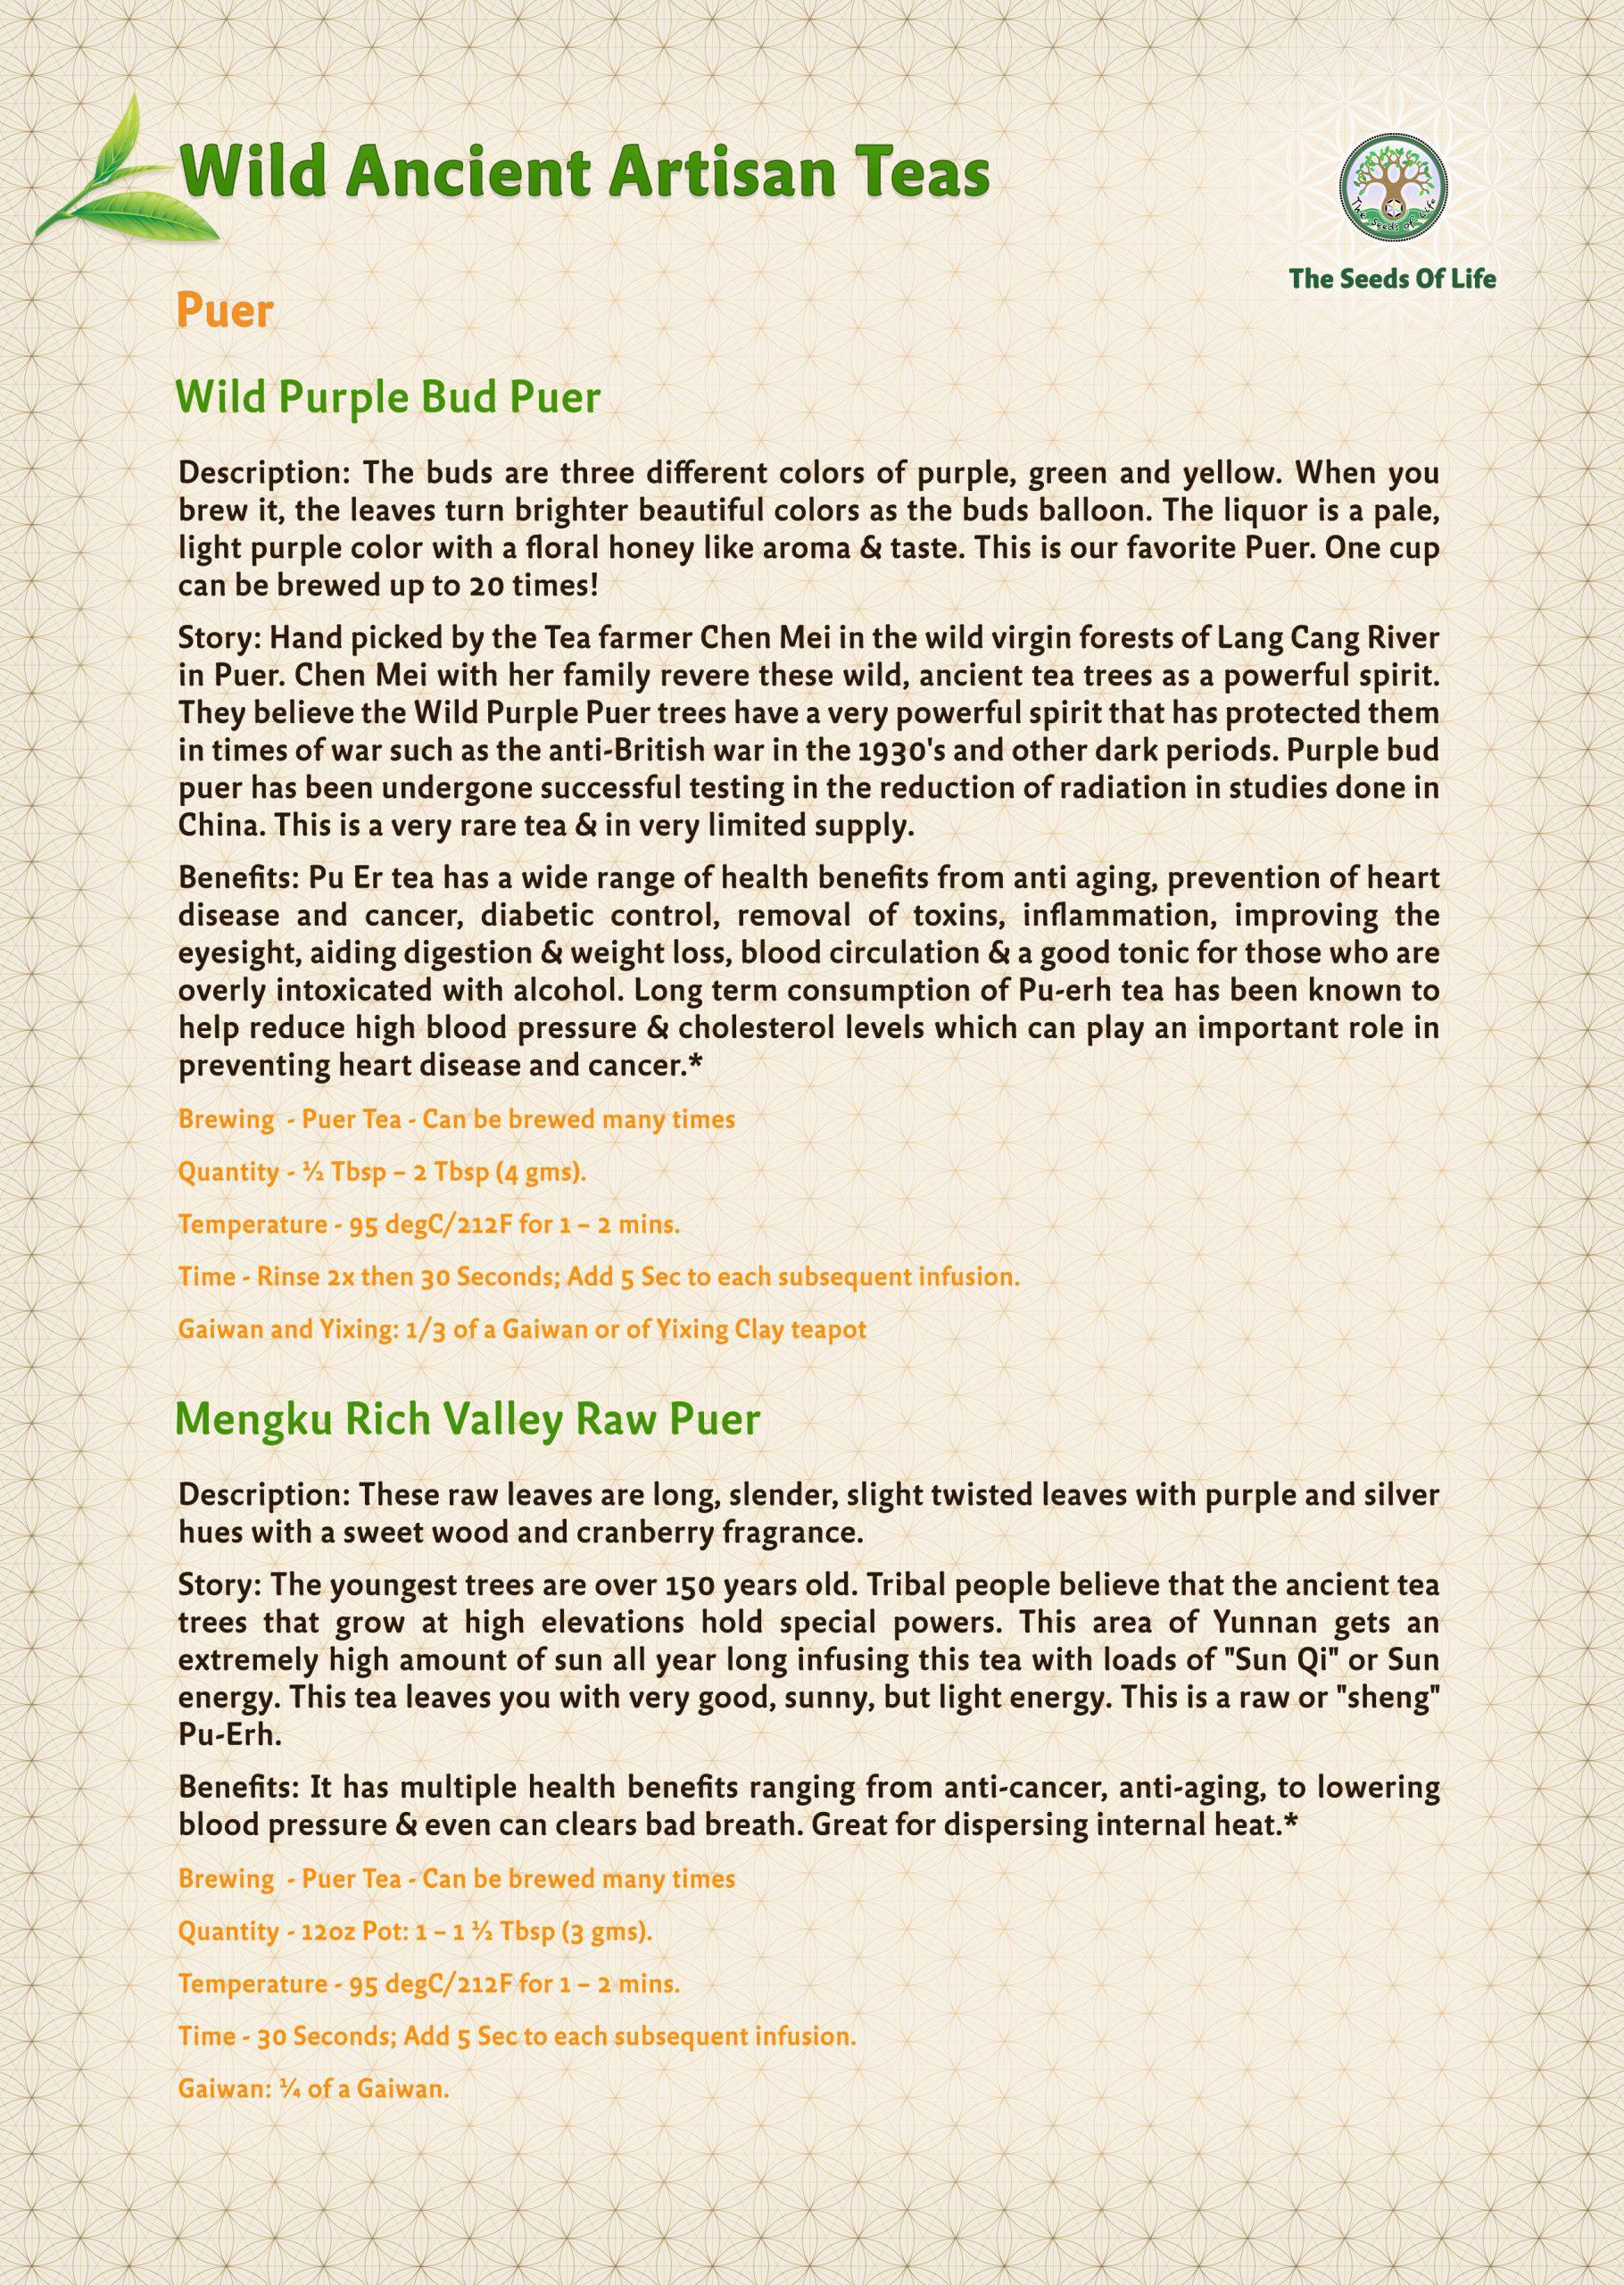 SOL_menu_teas-puer-p6_2014_03_04